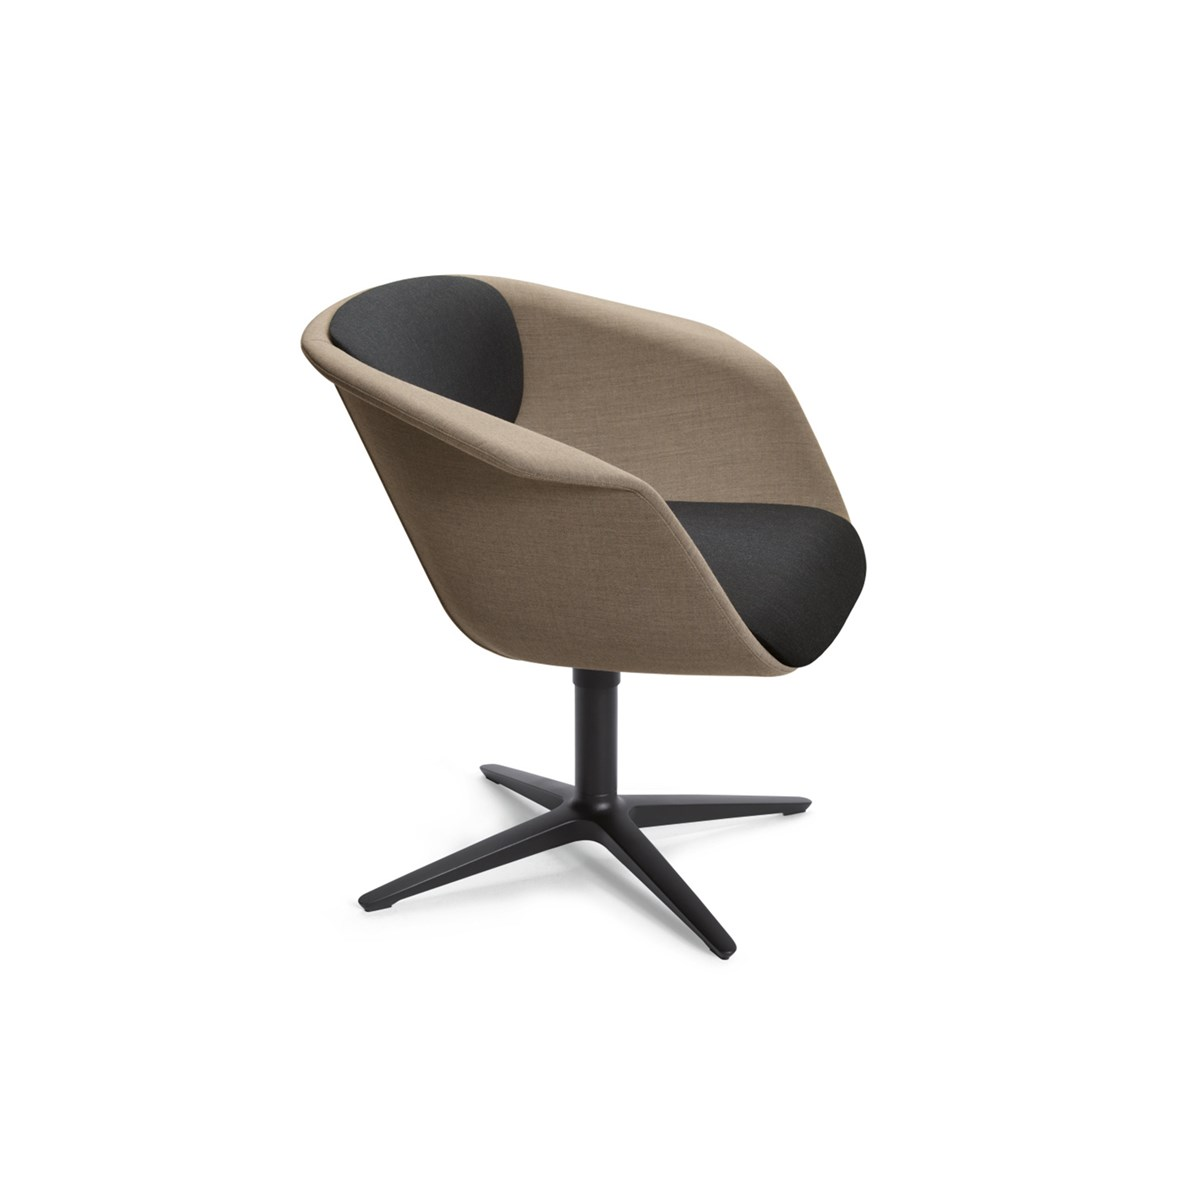 Sedus-Sweetspot-Armchair-Matisse-2